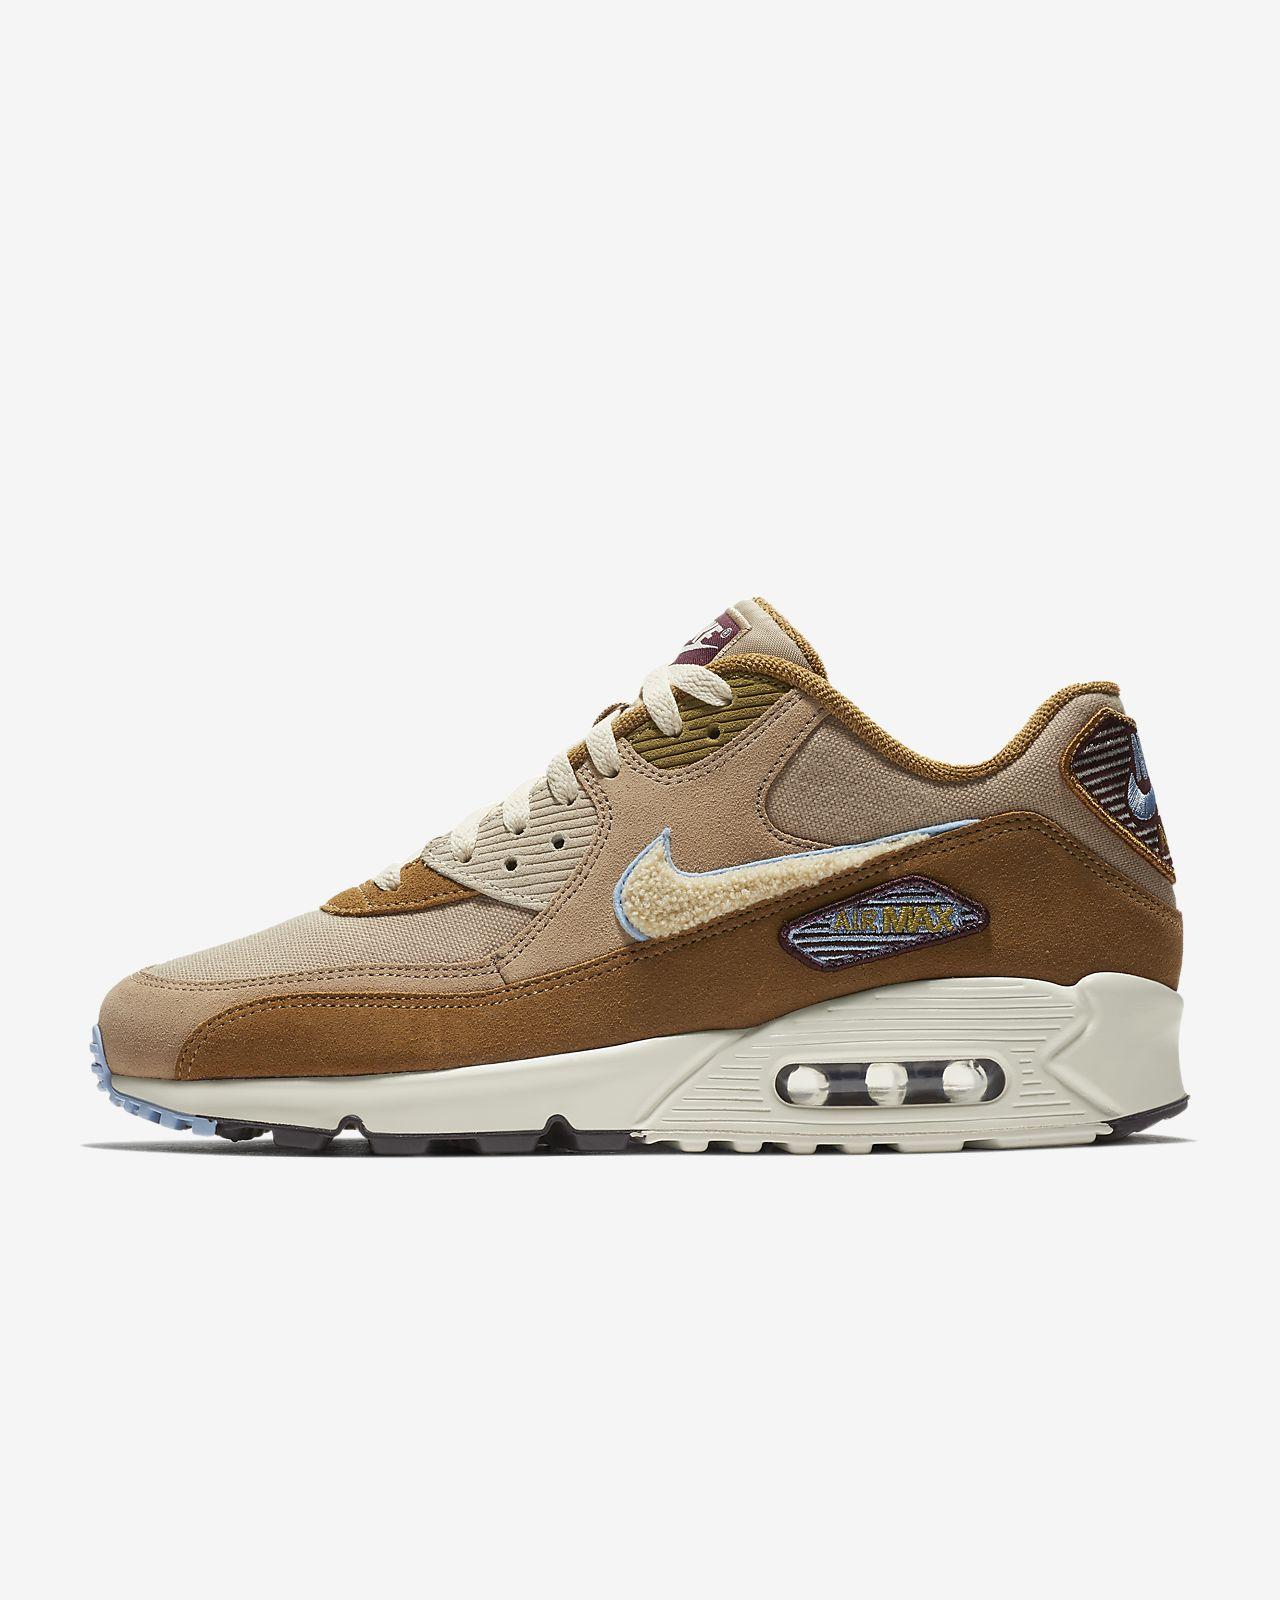 Nike Air Max 90 Premium SE Men's Shoe